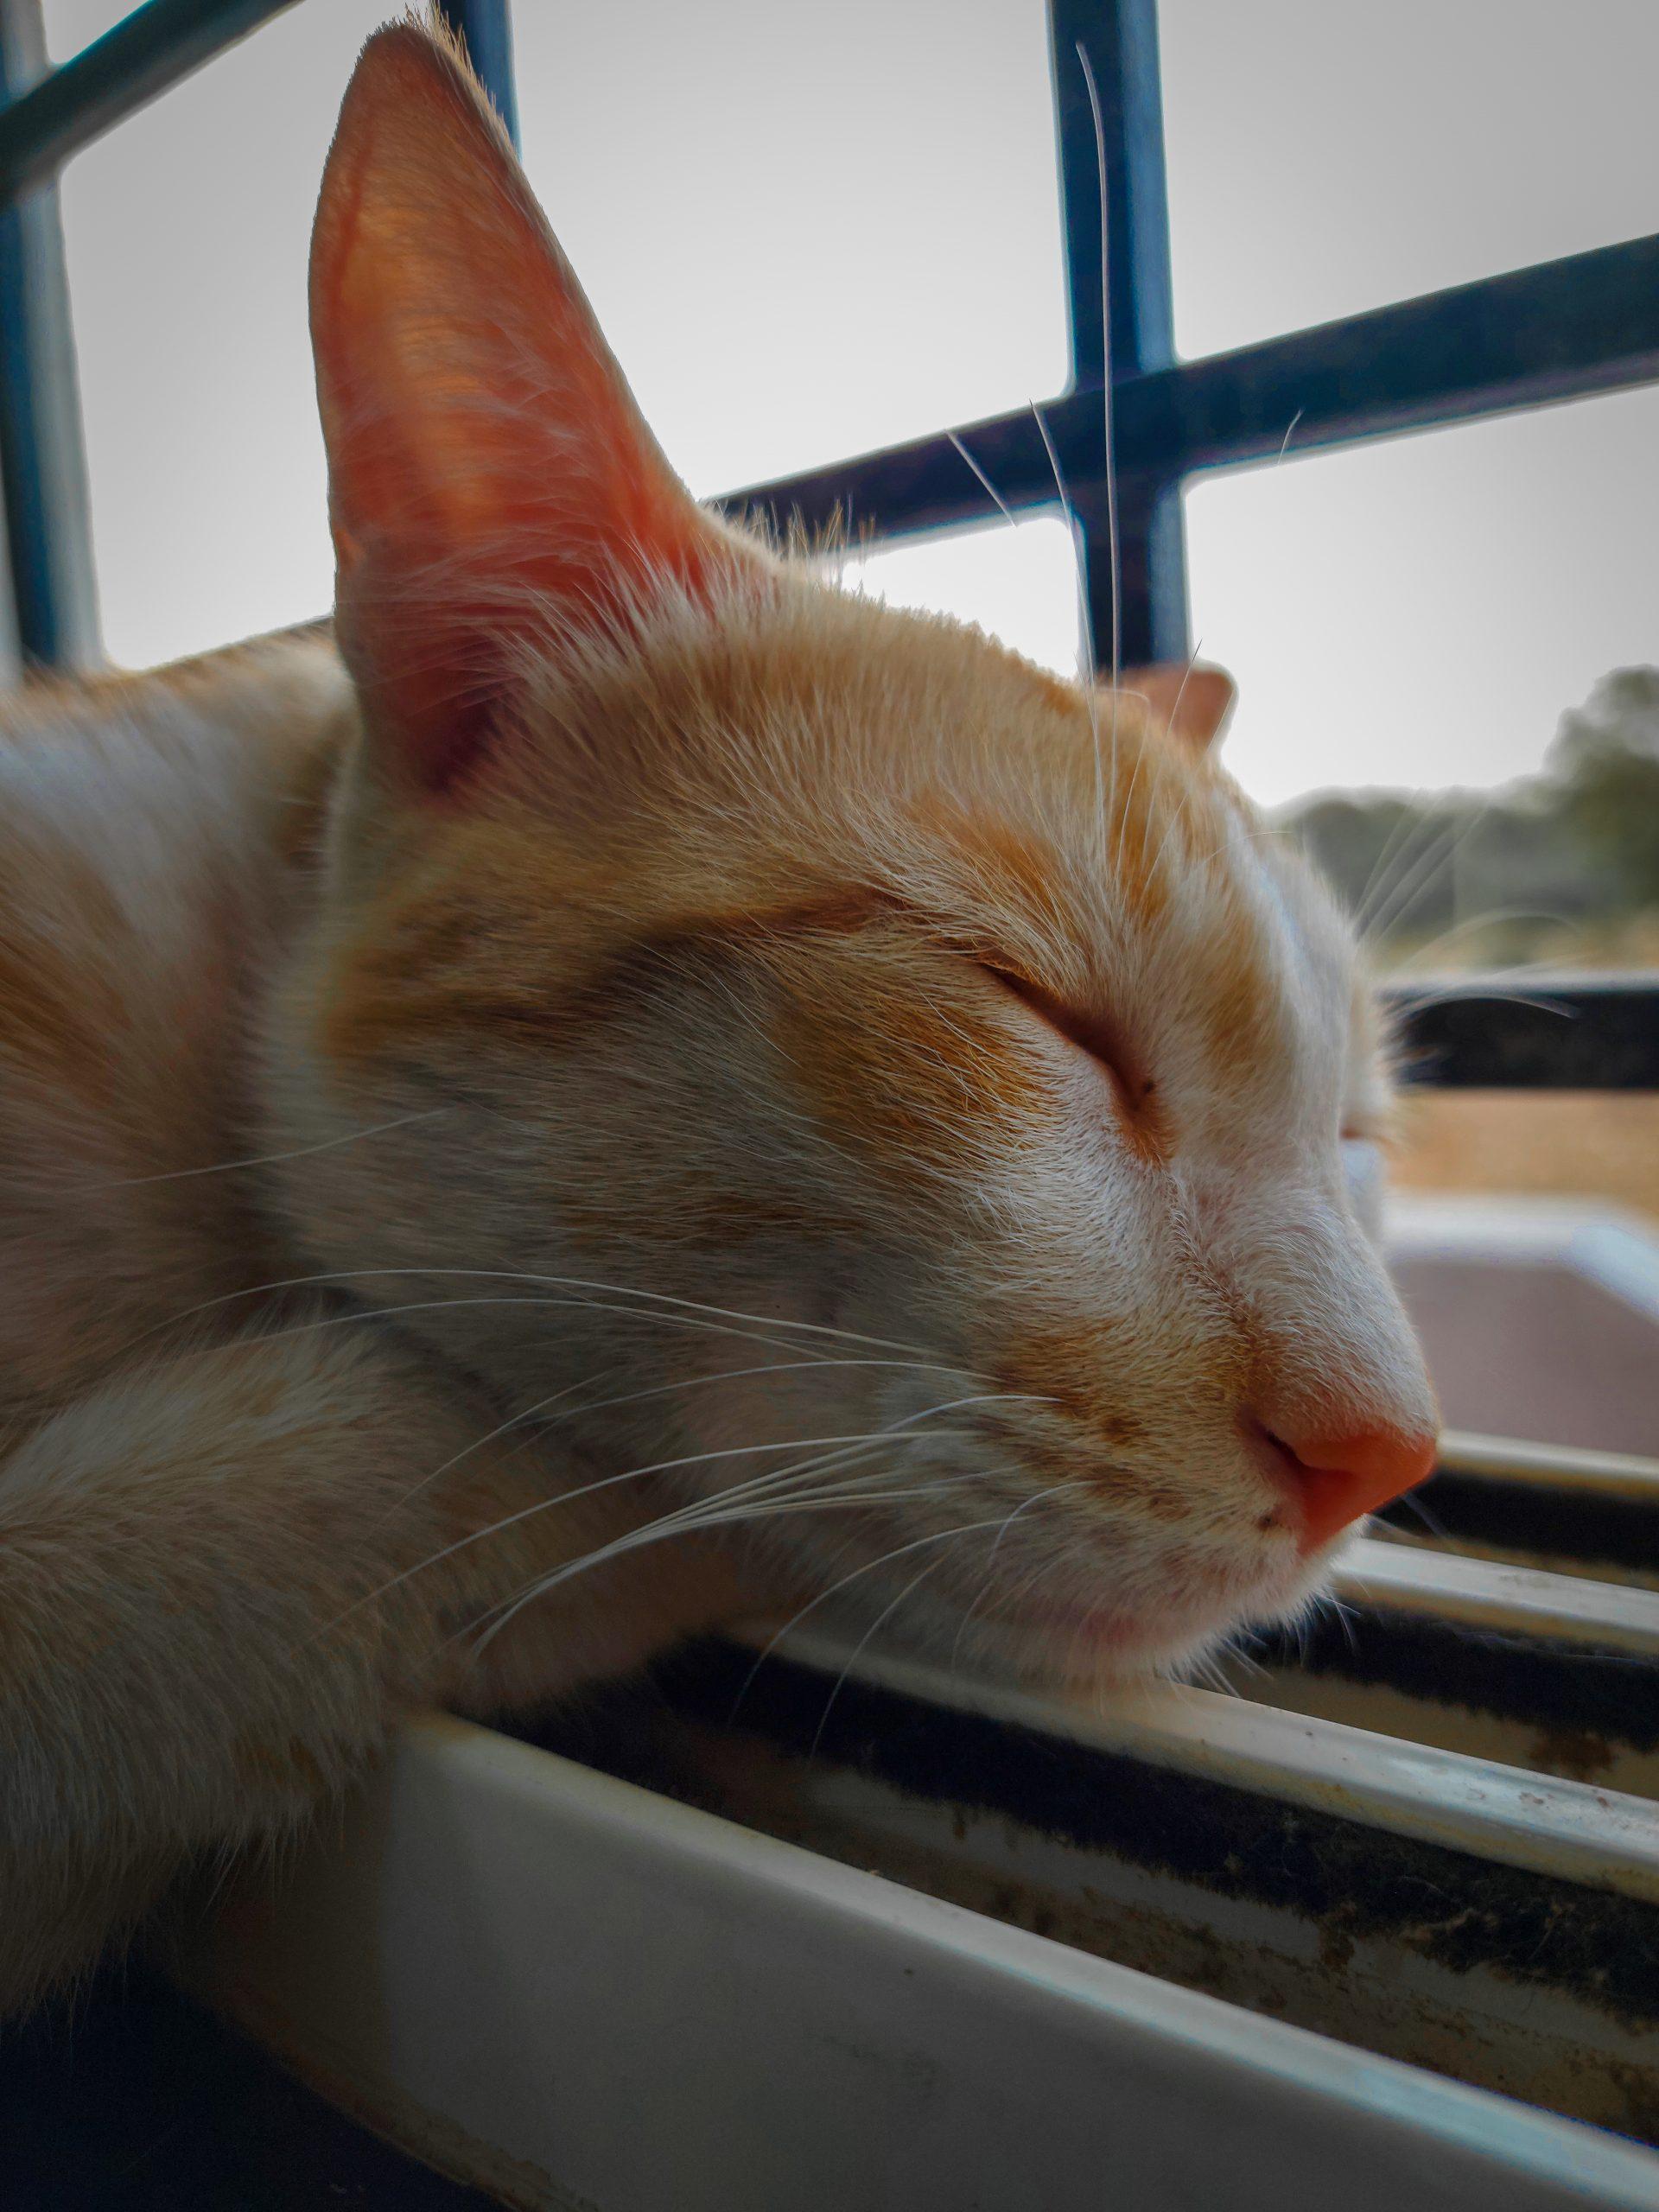 Sleeping cat at the window